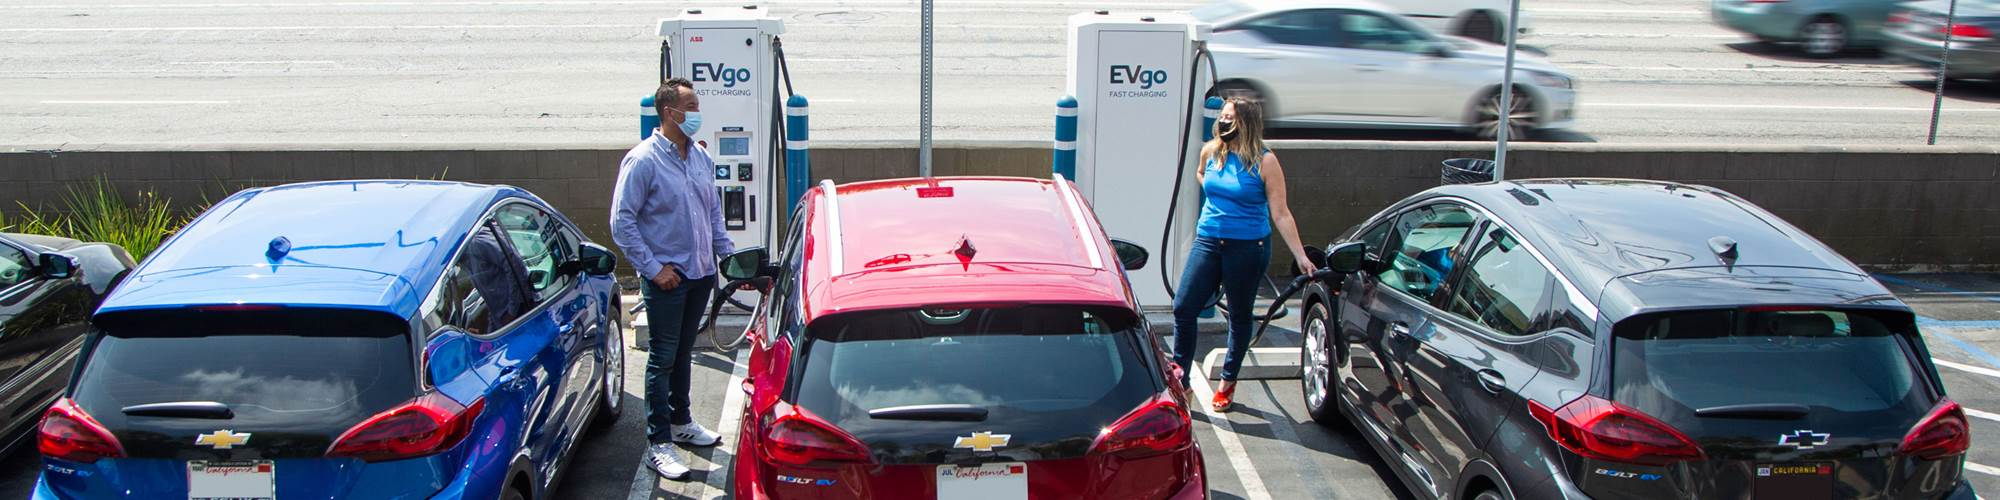 GM EVgo charging